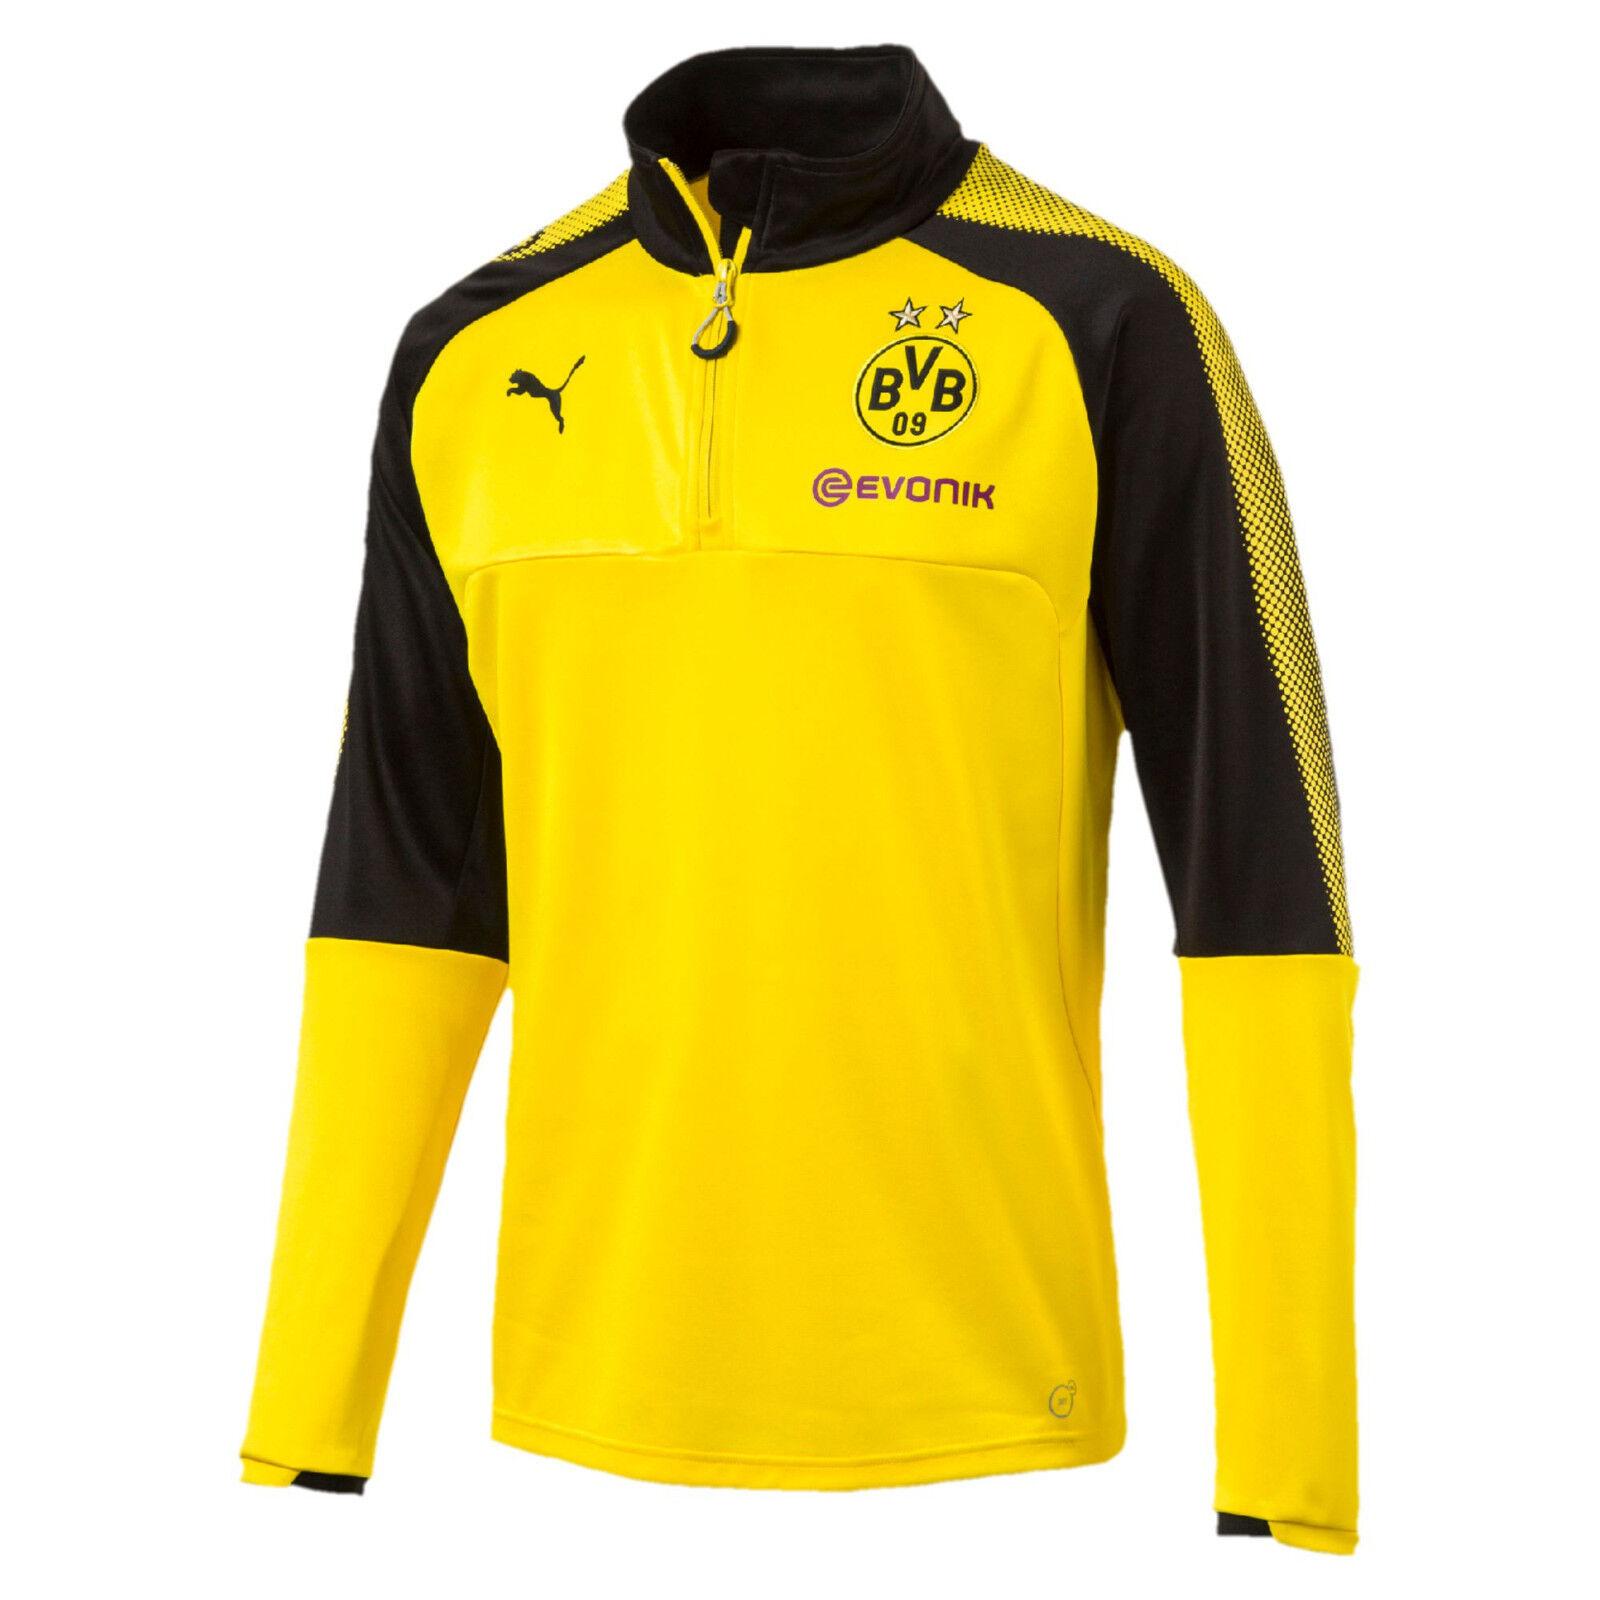 Puma BVB Borussia Dortmund Official 2017 - 2018 Soccer DryCell Training Top Yell